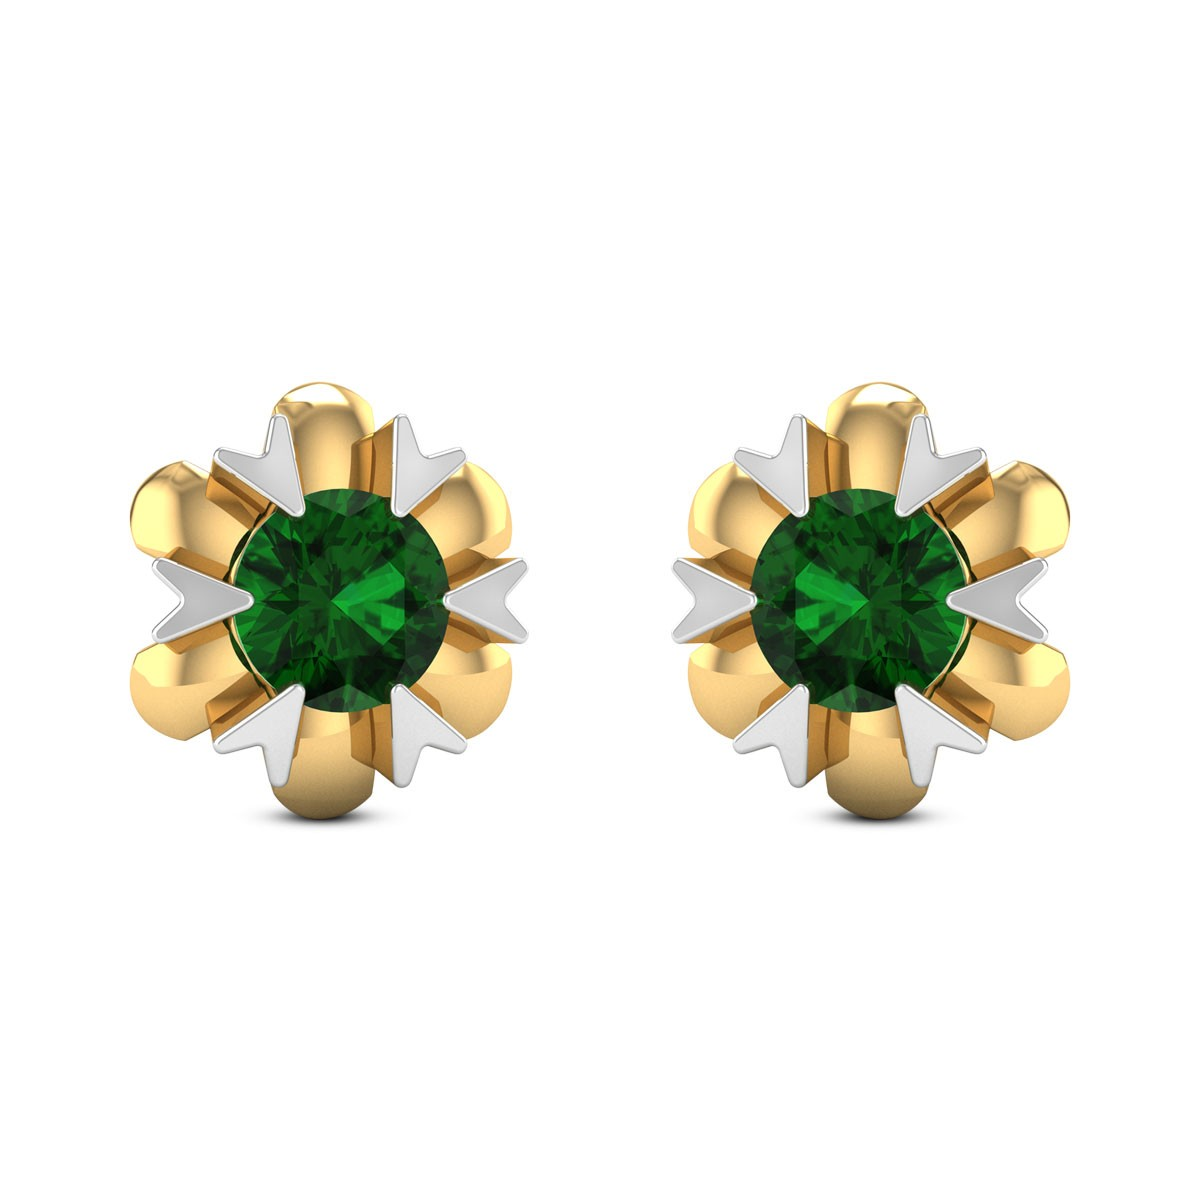 Etlingera Stud Earrings